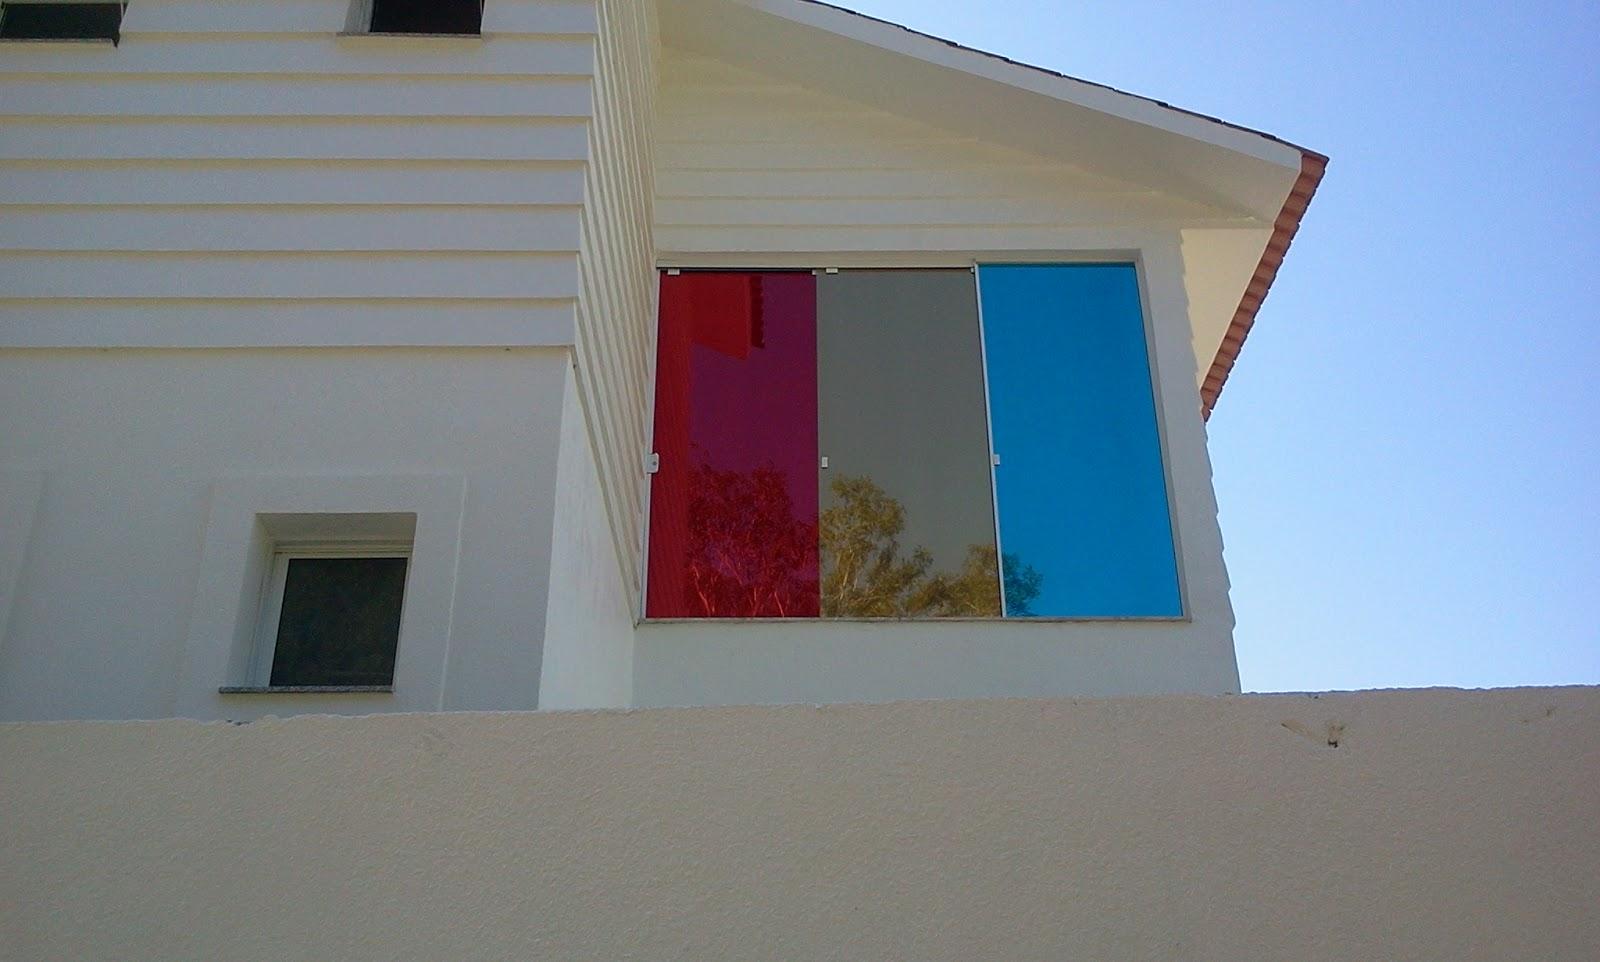 #0766C4 Construindo Minha Casa Clean: Película Residencial 1592 Vidros Nas Janelas